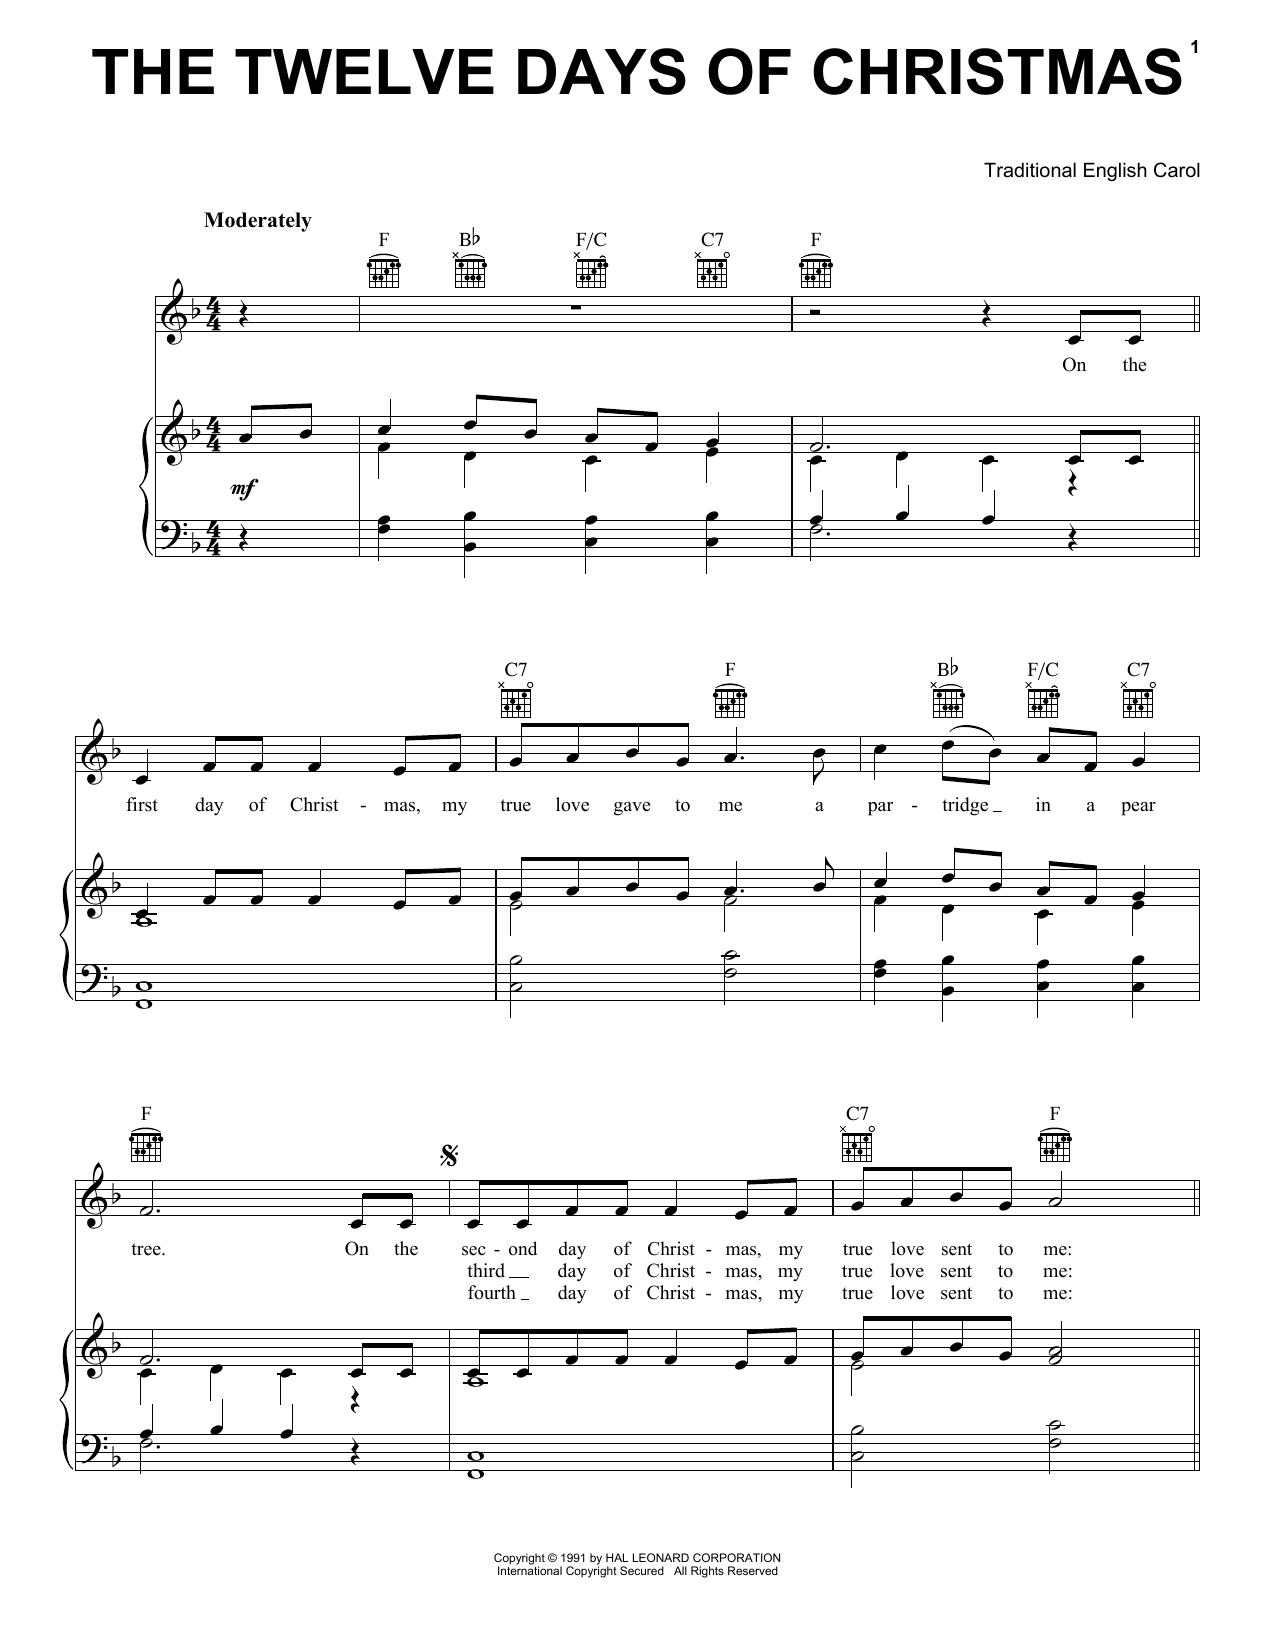 The Twelve Days Of Christmas sheet music